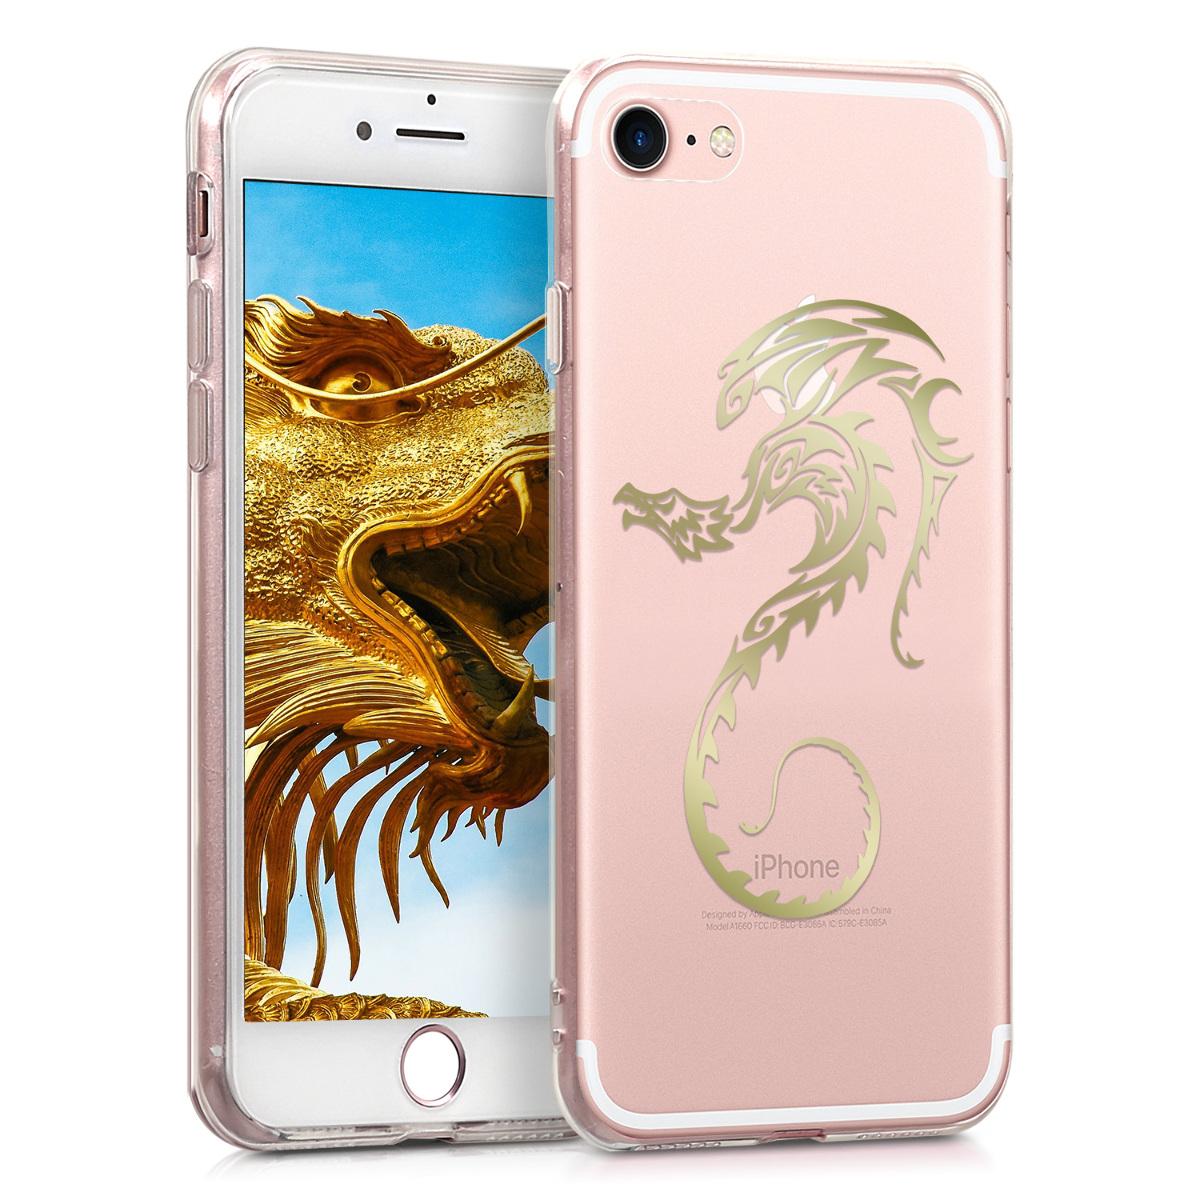 Kvalitní silikonové TPU pouzdro pro Apple iPhone 7 / 8 / SE  - Tribal Dragon Gold | Transparent